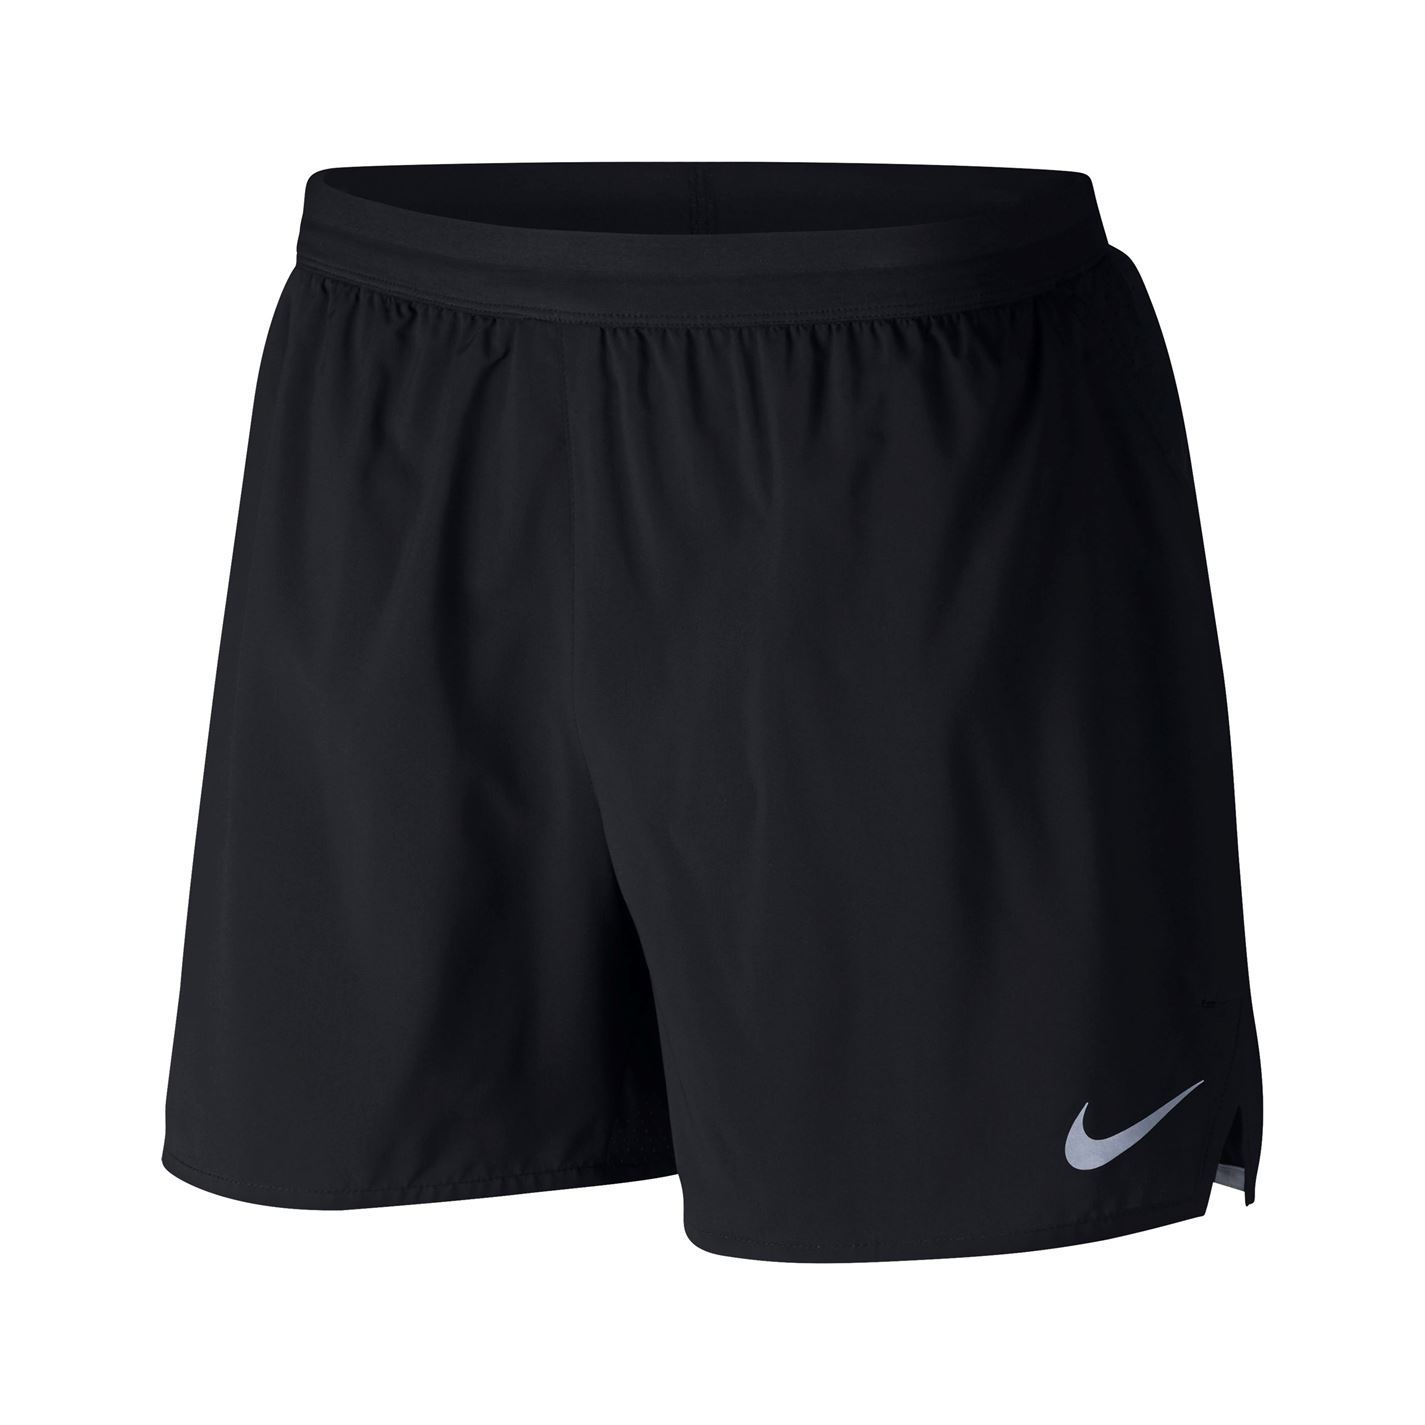 ccd6fb55 Details about Nike Flex Stride Running Shorts Mens Bottoms Short Gym  Fitness Sportswear